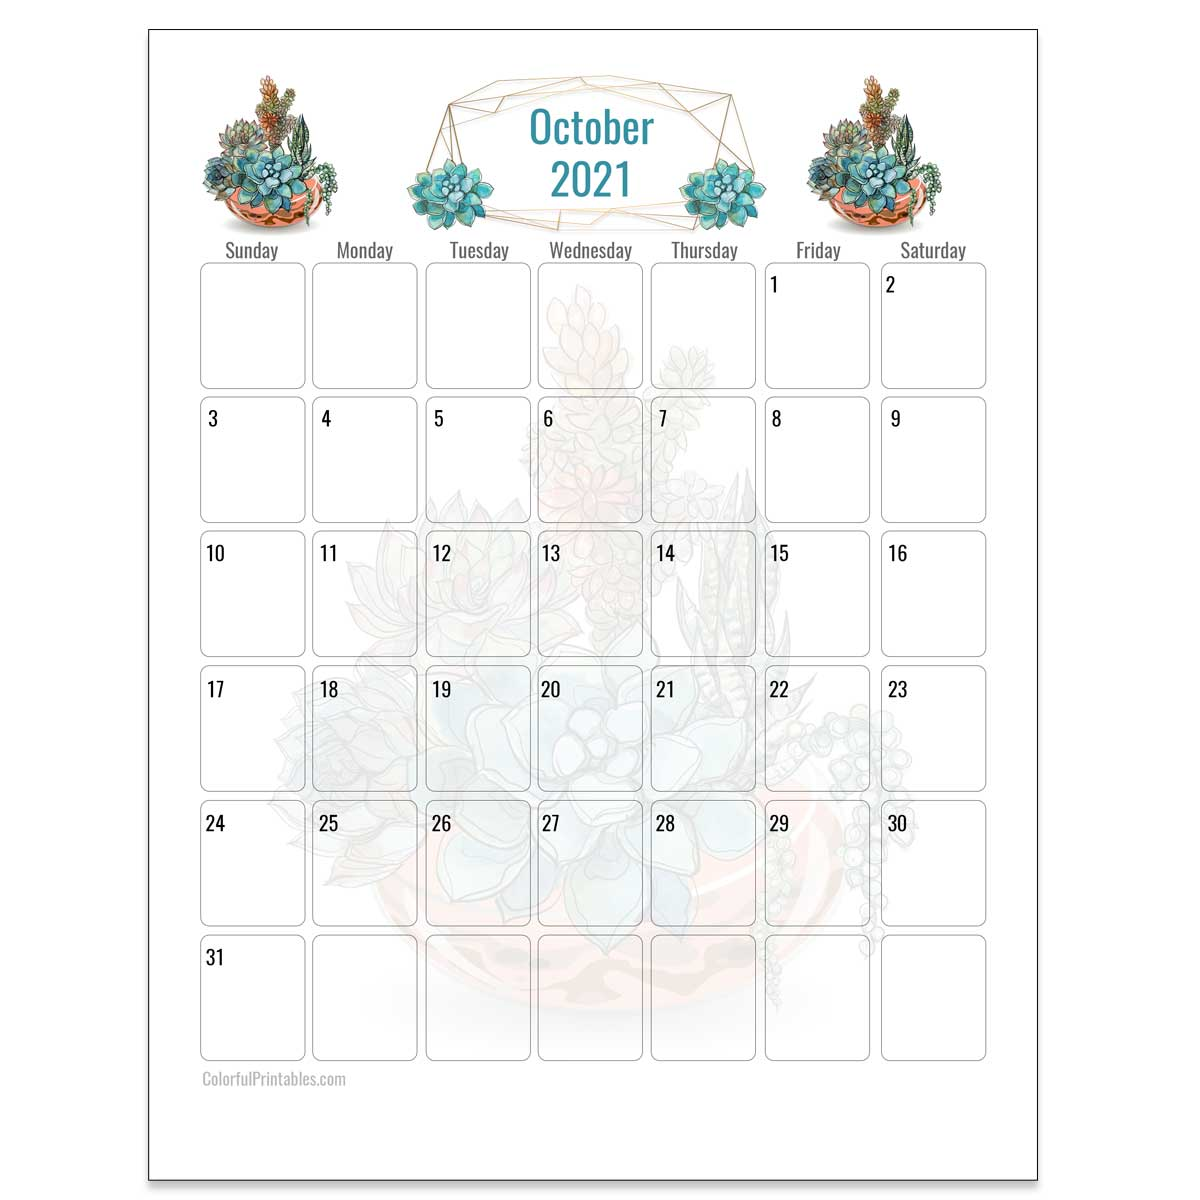 October Succulent calendar